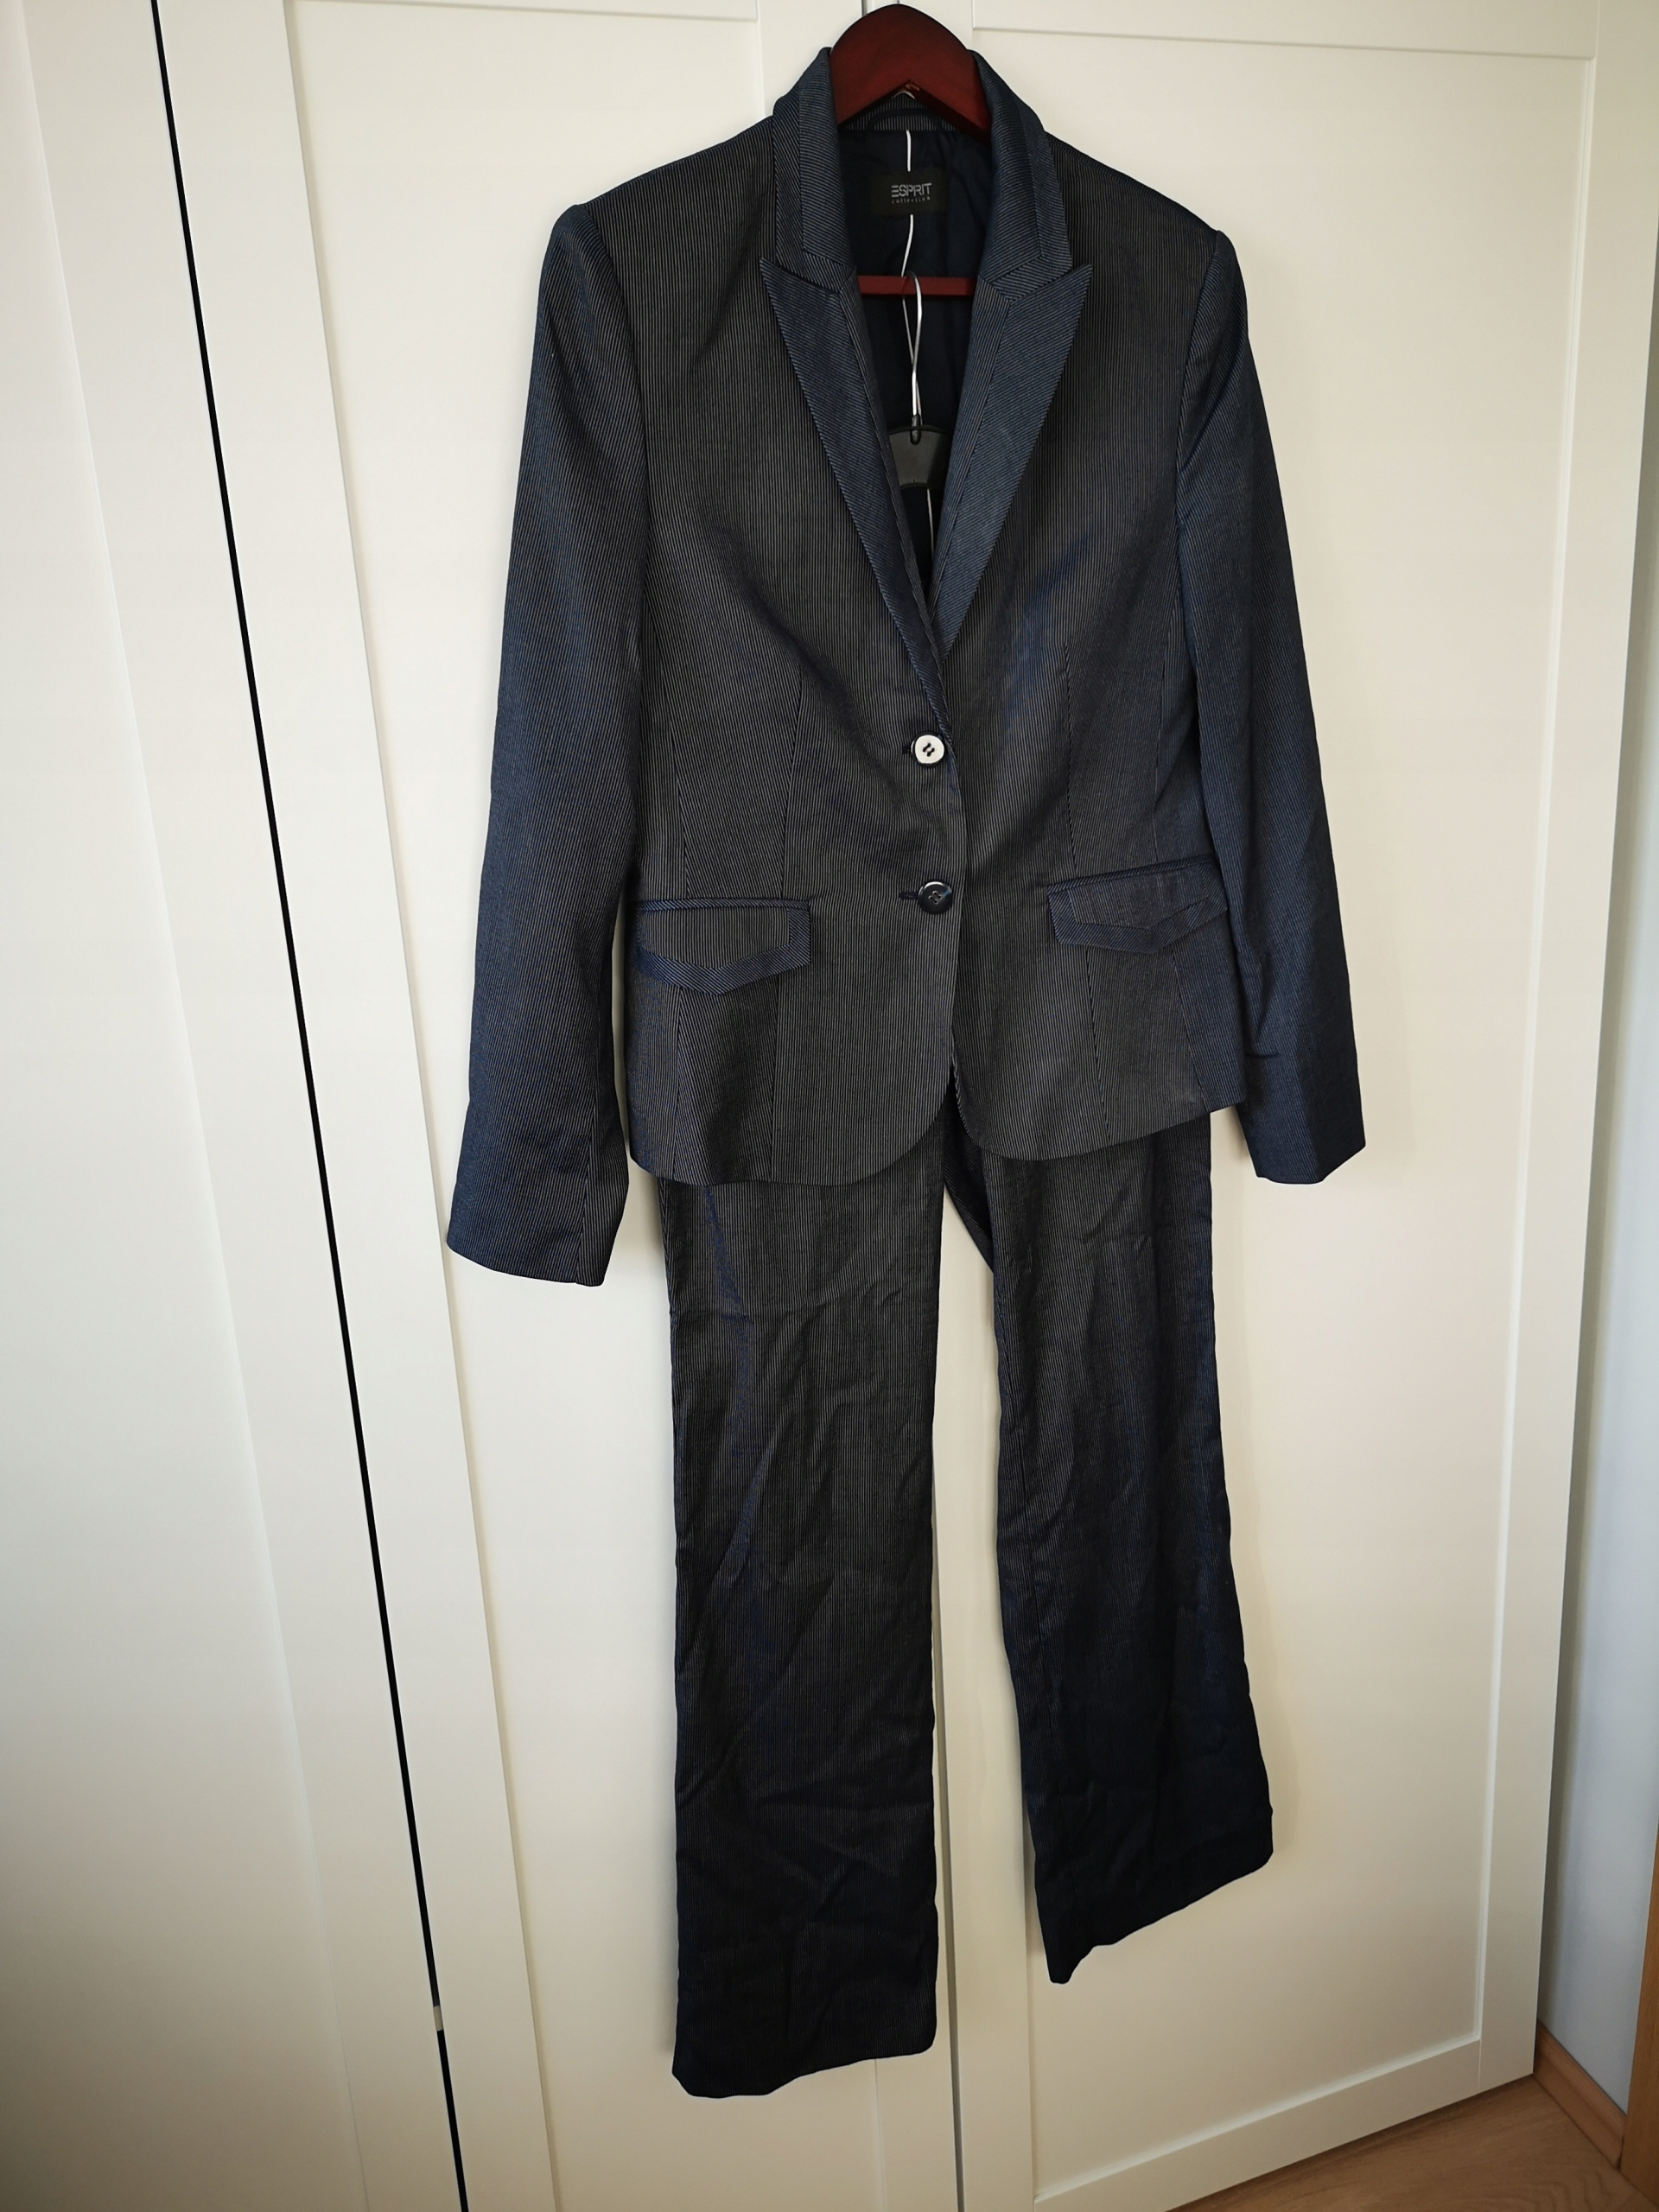 b1c7fa647f ESPRIT marynarka i spodnie komplet zara 38 40 - 7701217212 ...